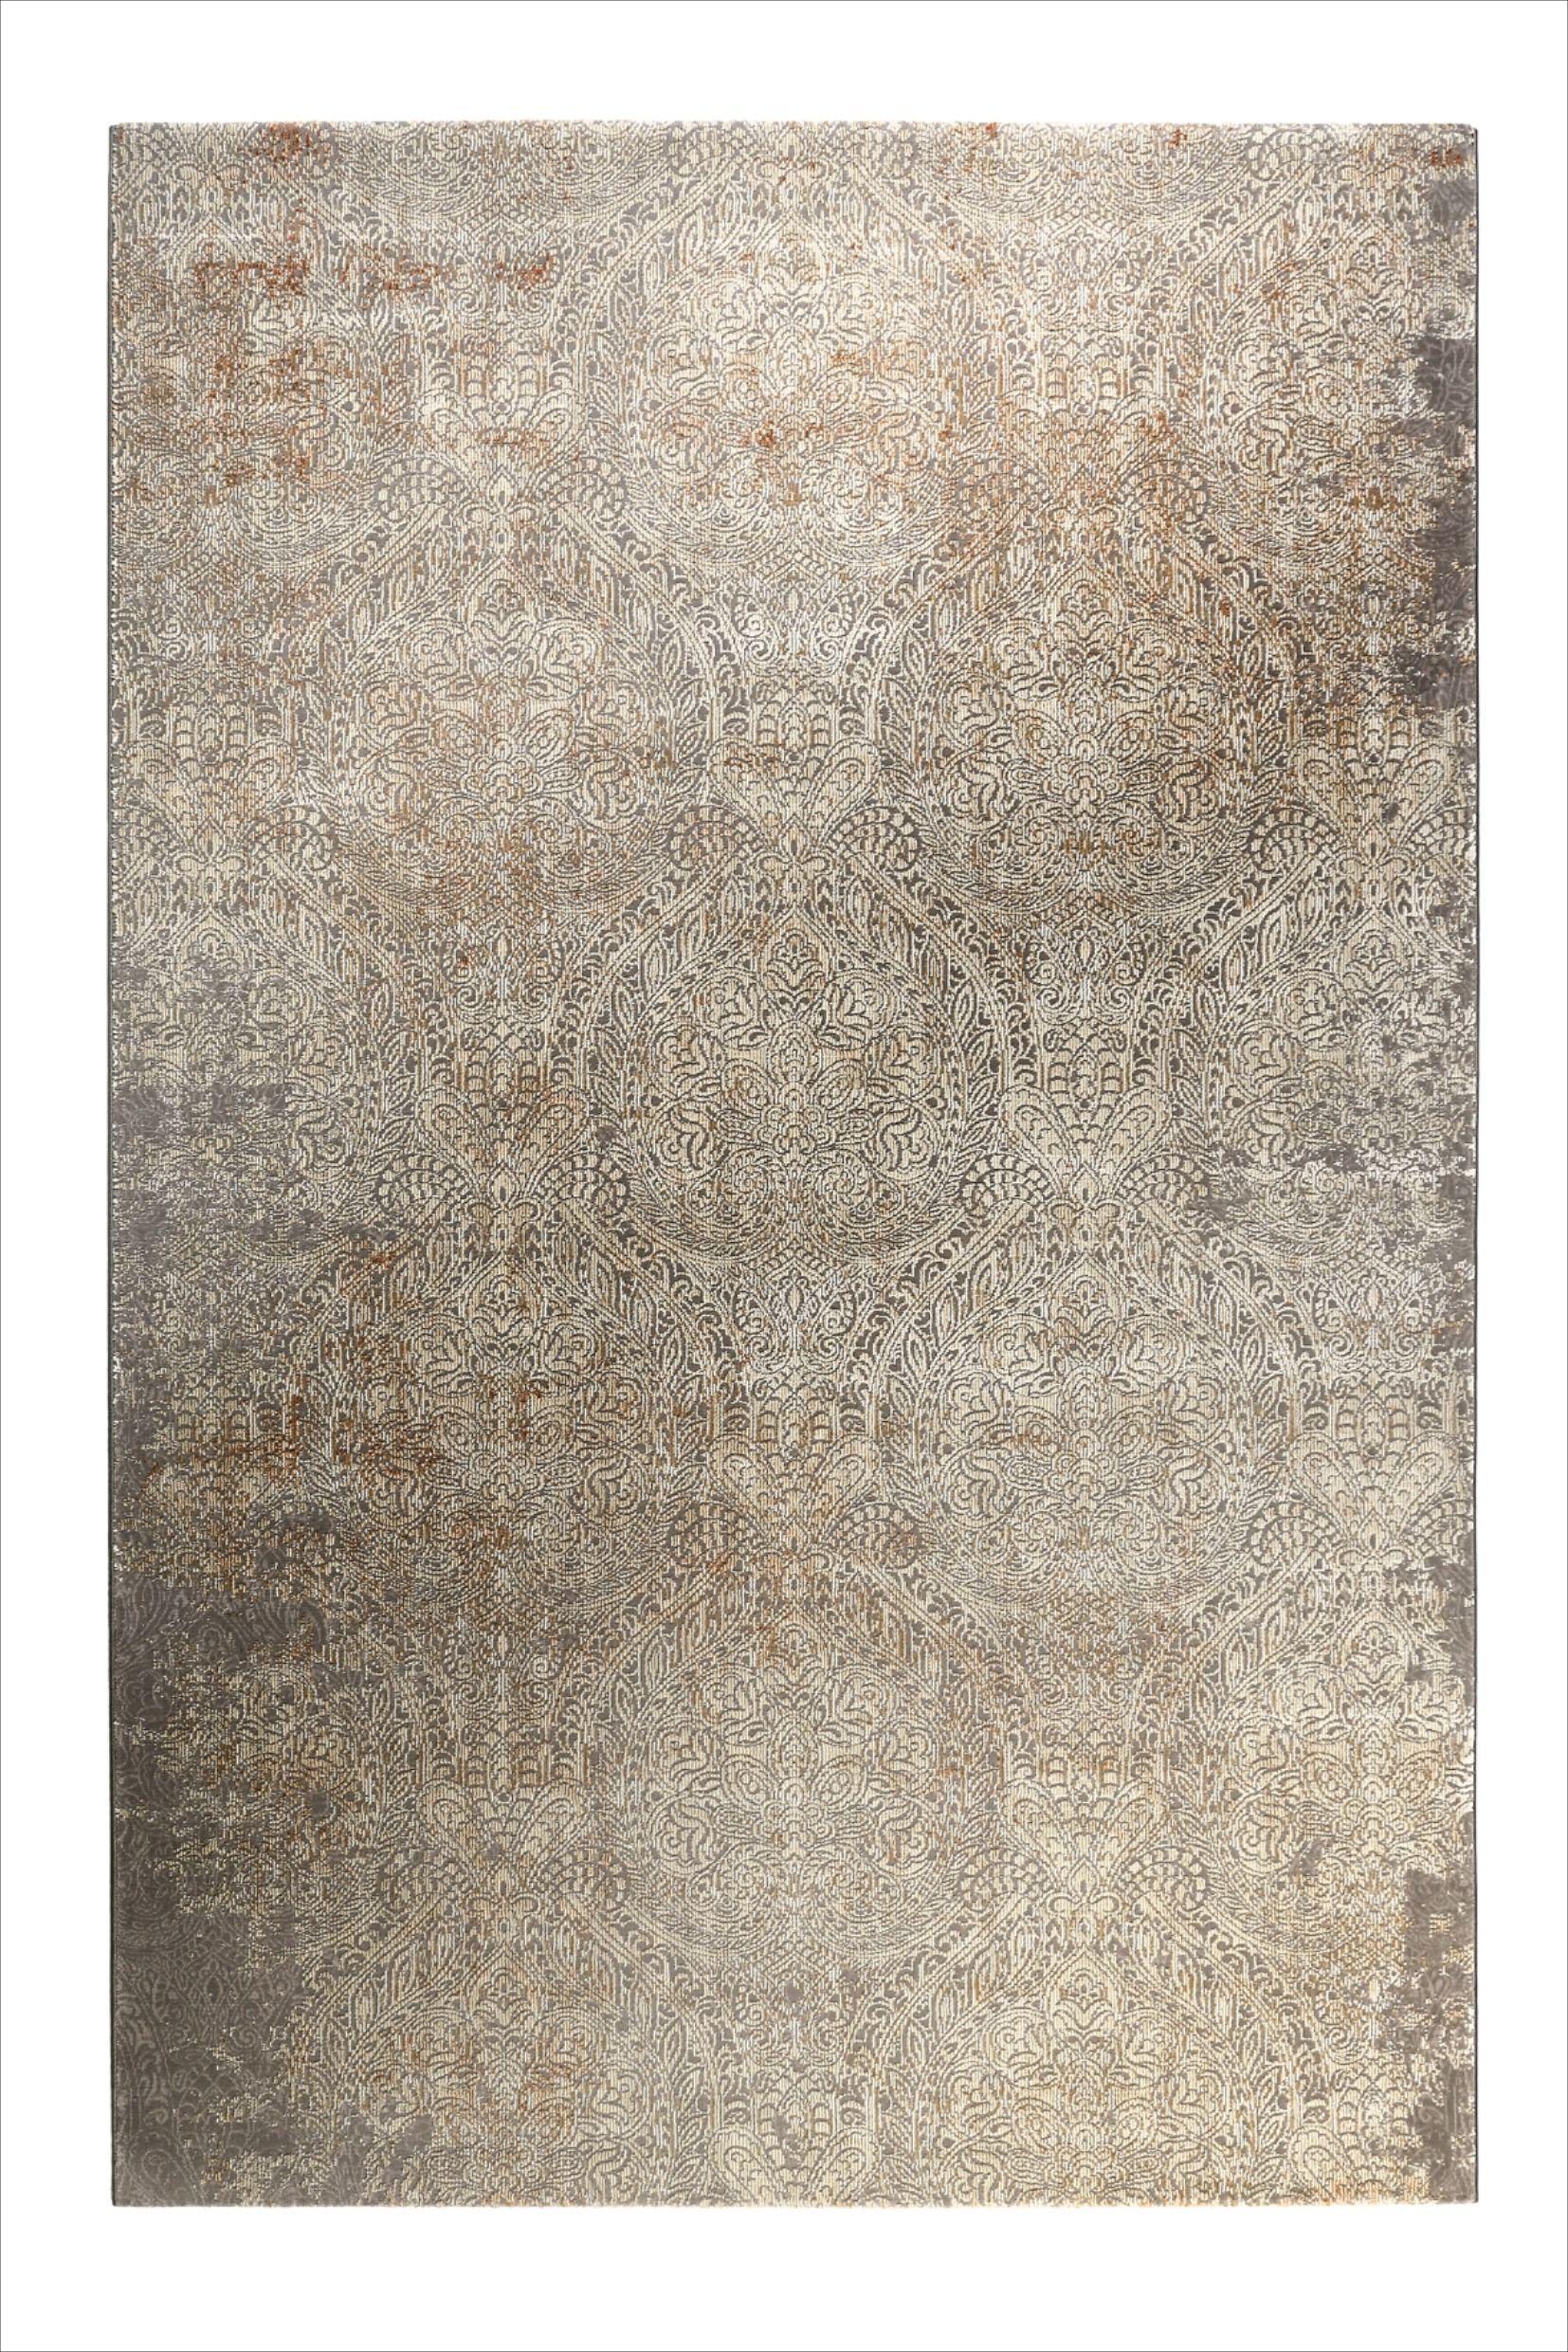 Teppich Grau Baroque Vintage Wecon Home In 2020 Teppich Grau Gemusterte Teppiche Teppich